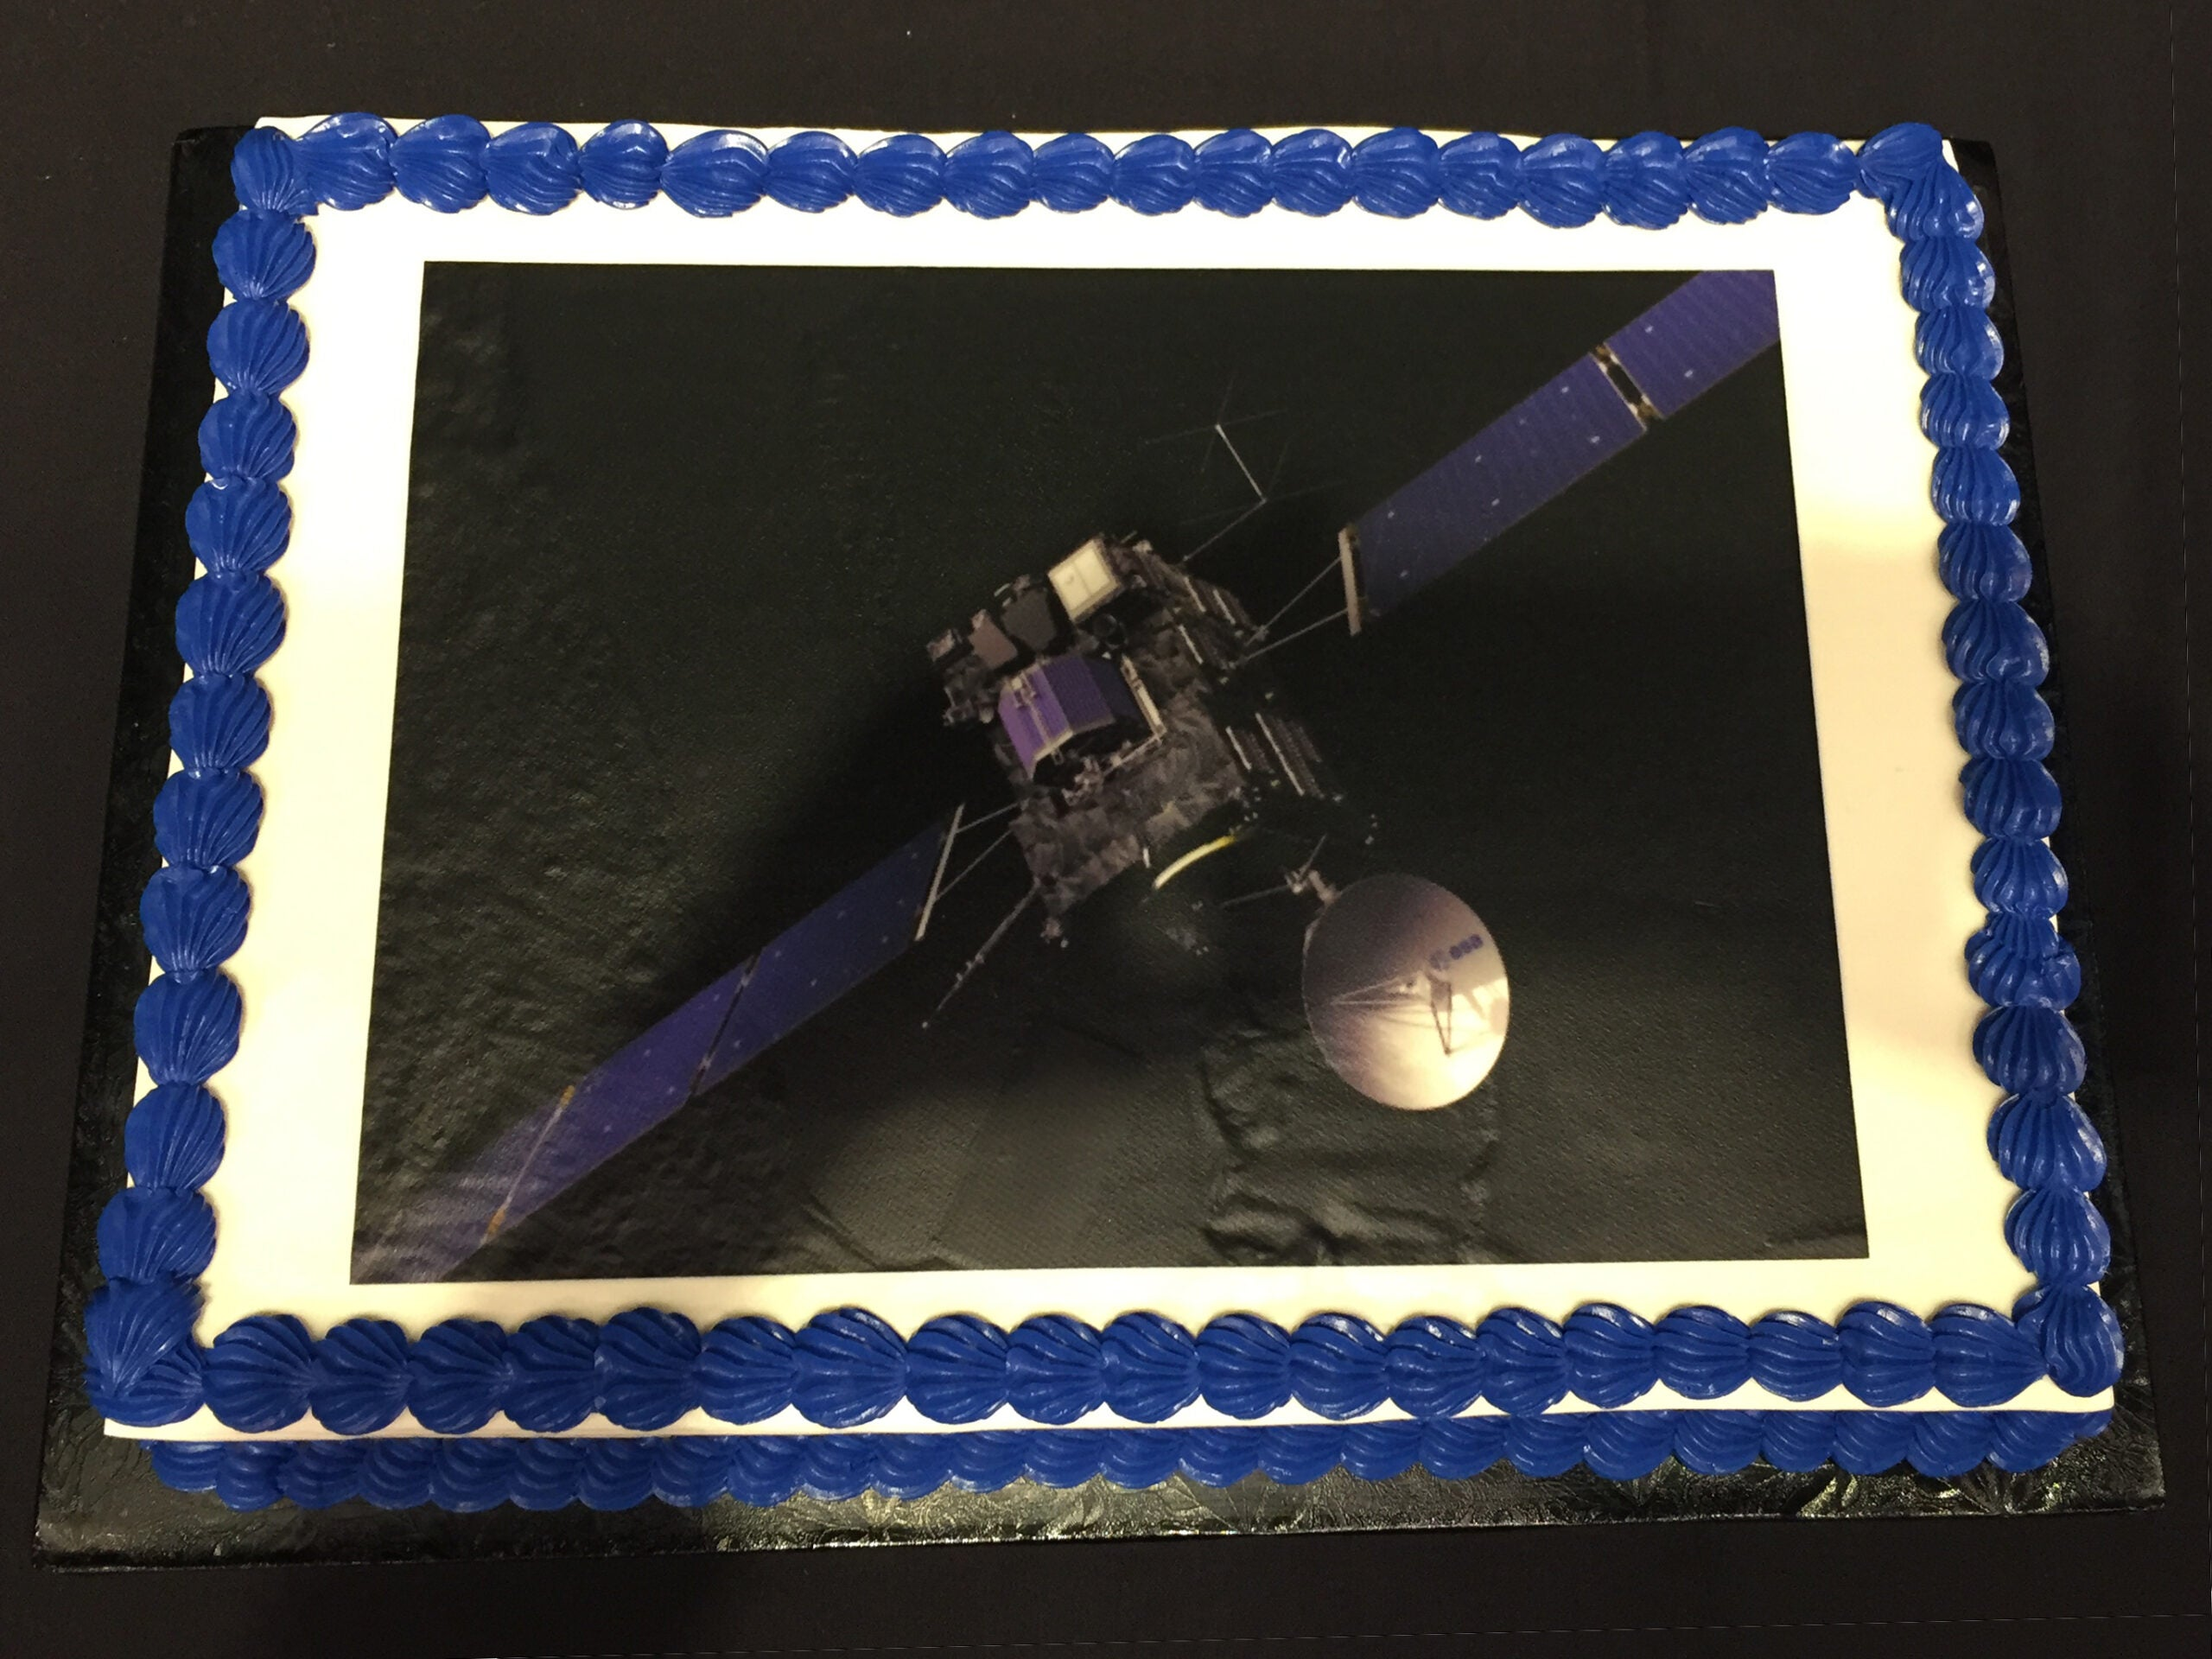 As Rosetta Spacecraft Crash-Lands Successfully, A Bittersweet Celebration